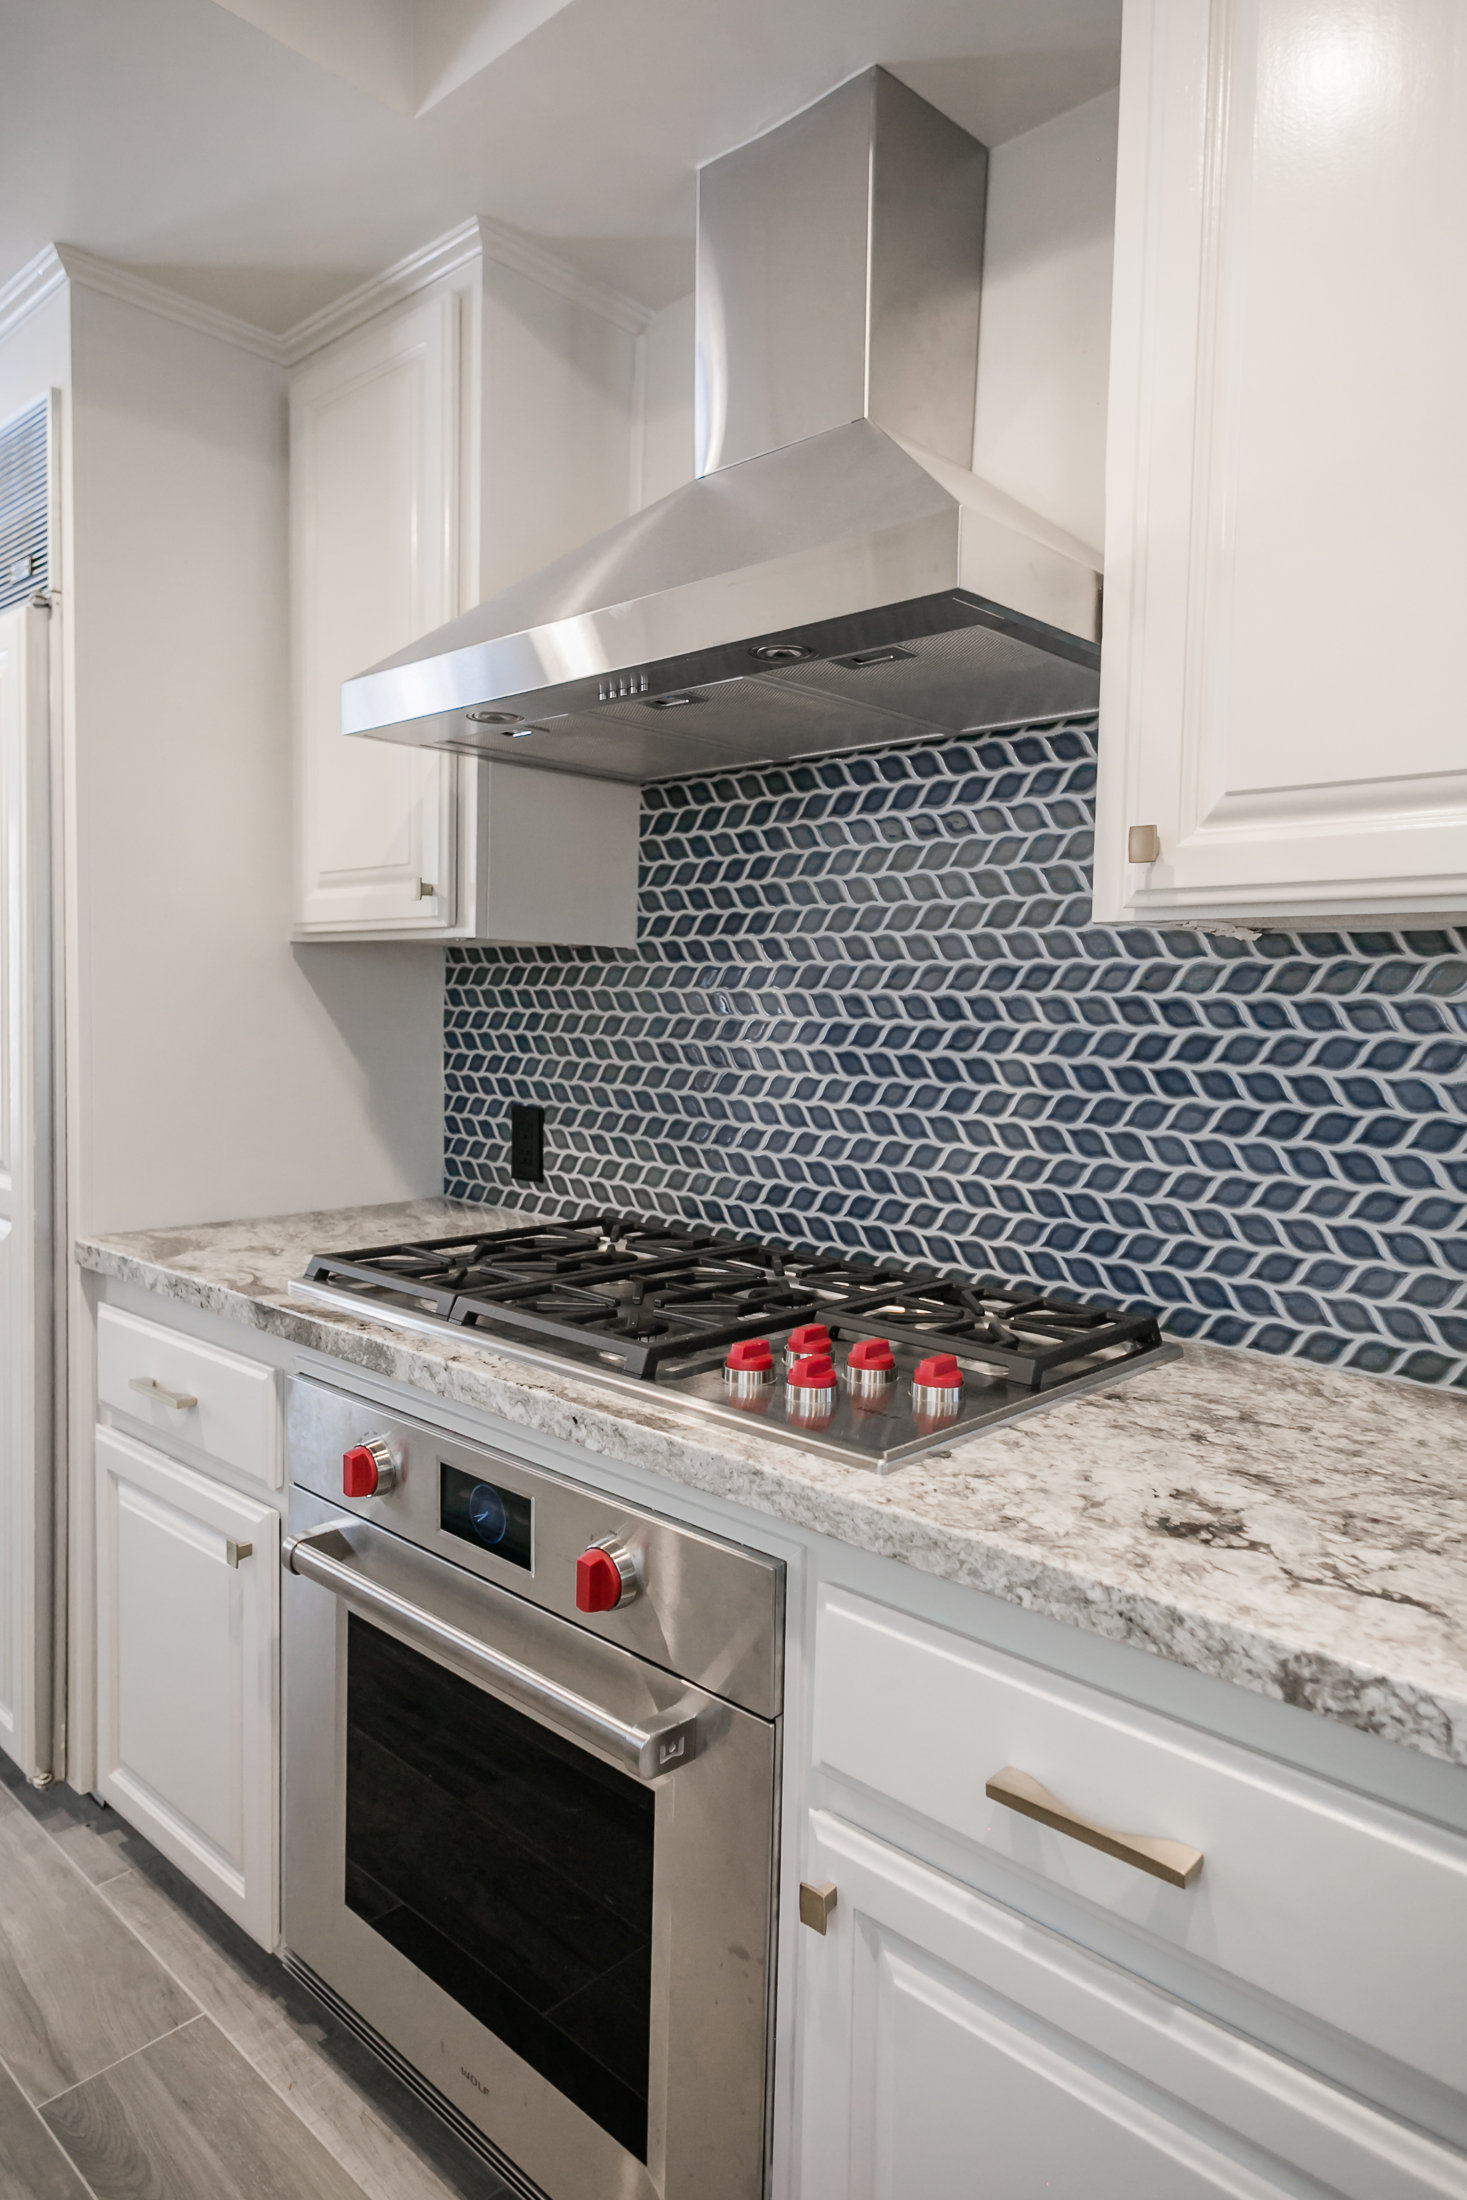 very blue kitchen, Kitchen, Dining Room, remodel, painted ceiling, dmv interior designer, bowie maryland, washington dc, pulls, wolf, subzero